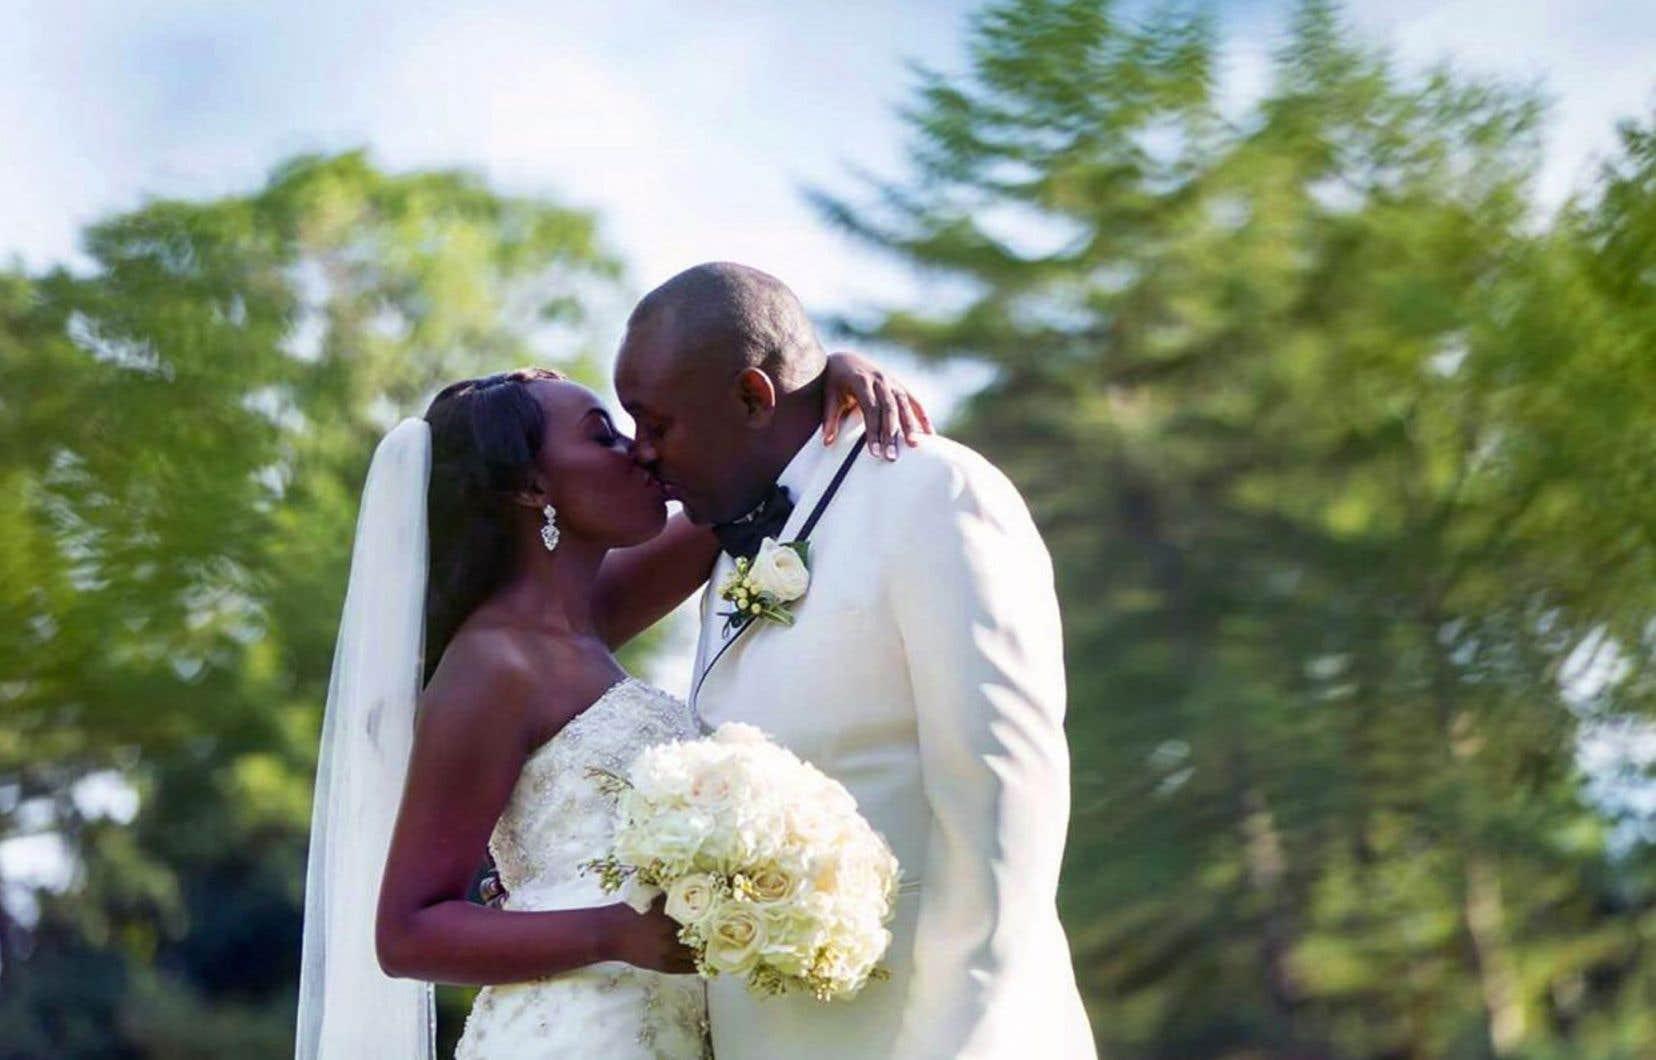 Sarah Pyndji et Fabrice Mugaragu ont eu un mariage occidental précédé de multiples traditions rwandaises.